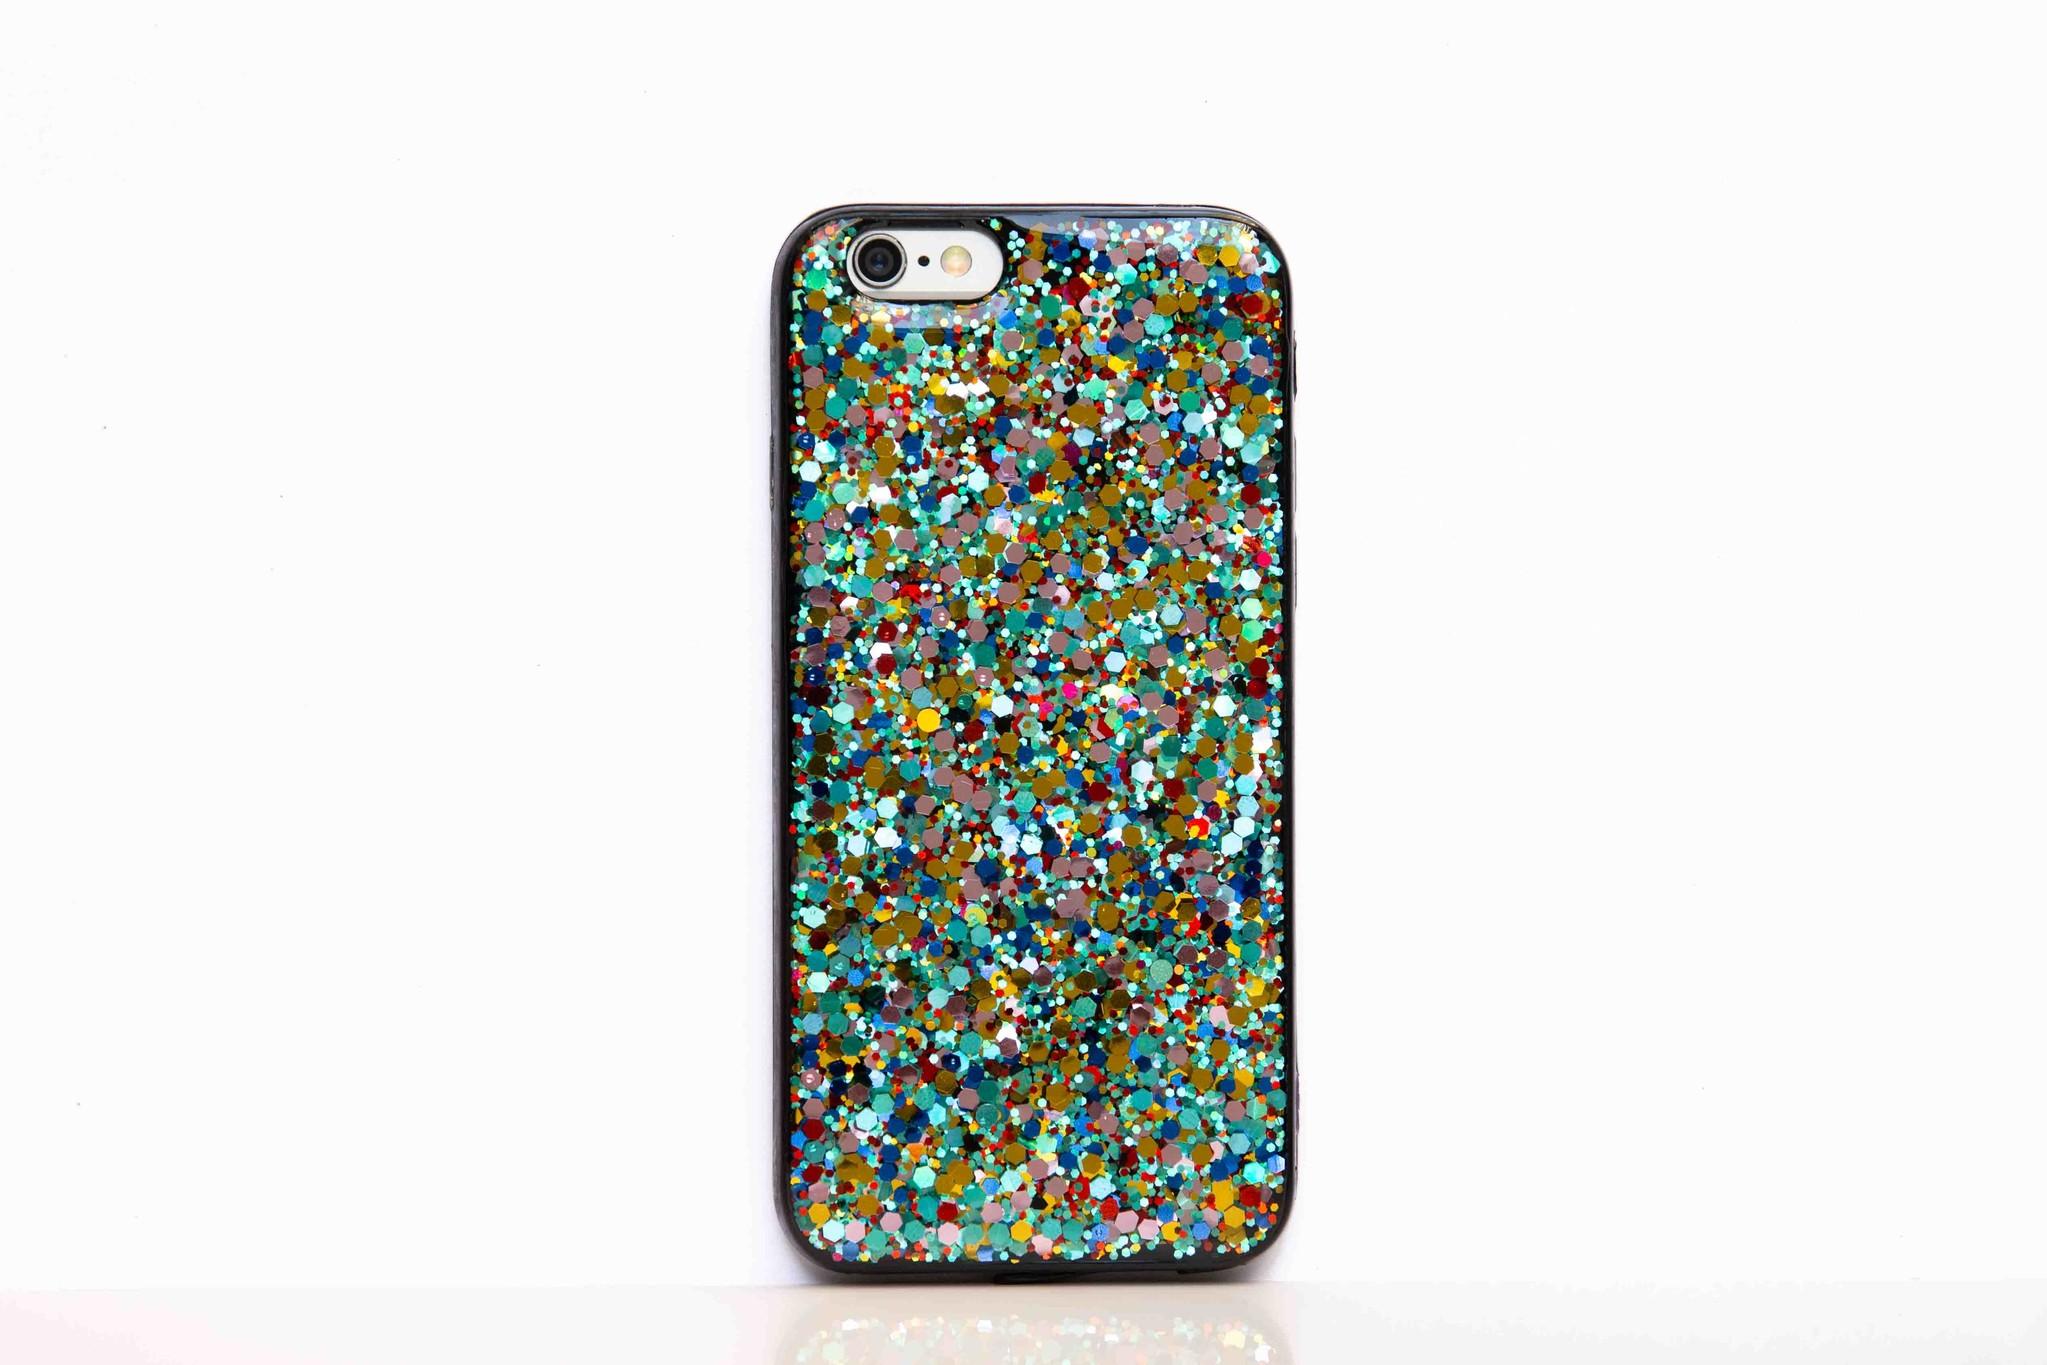 Smartphonehoesje iPhone 6s | Bling (glitter) | Multicolor